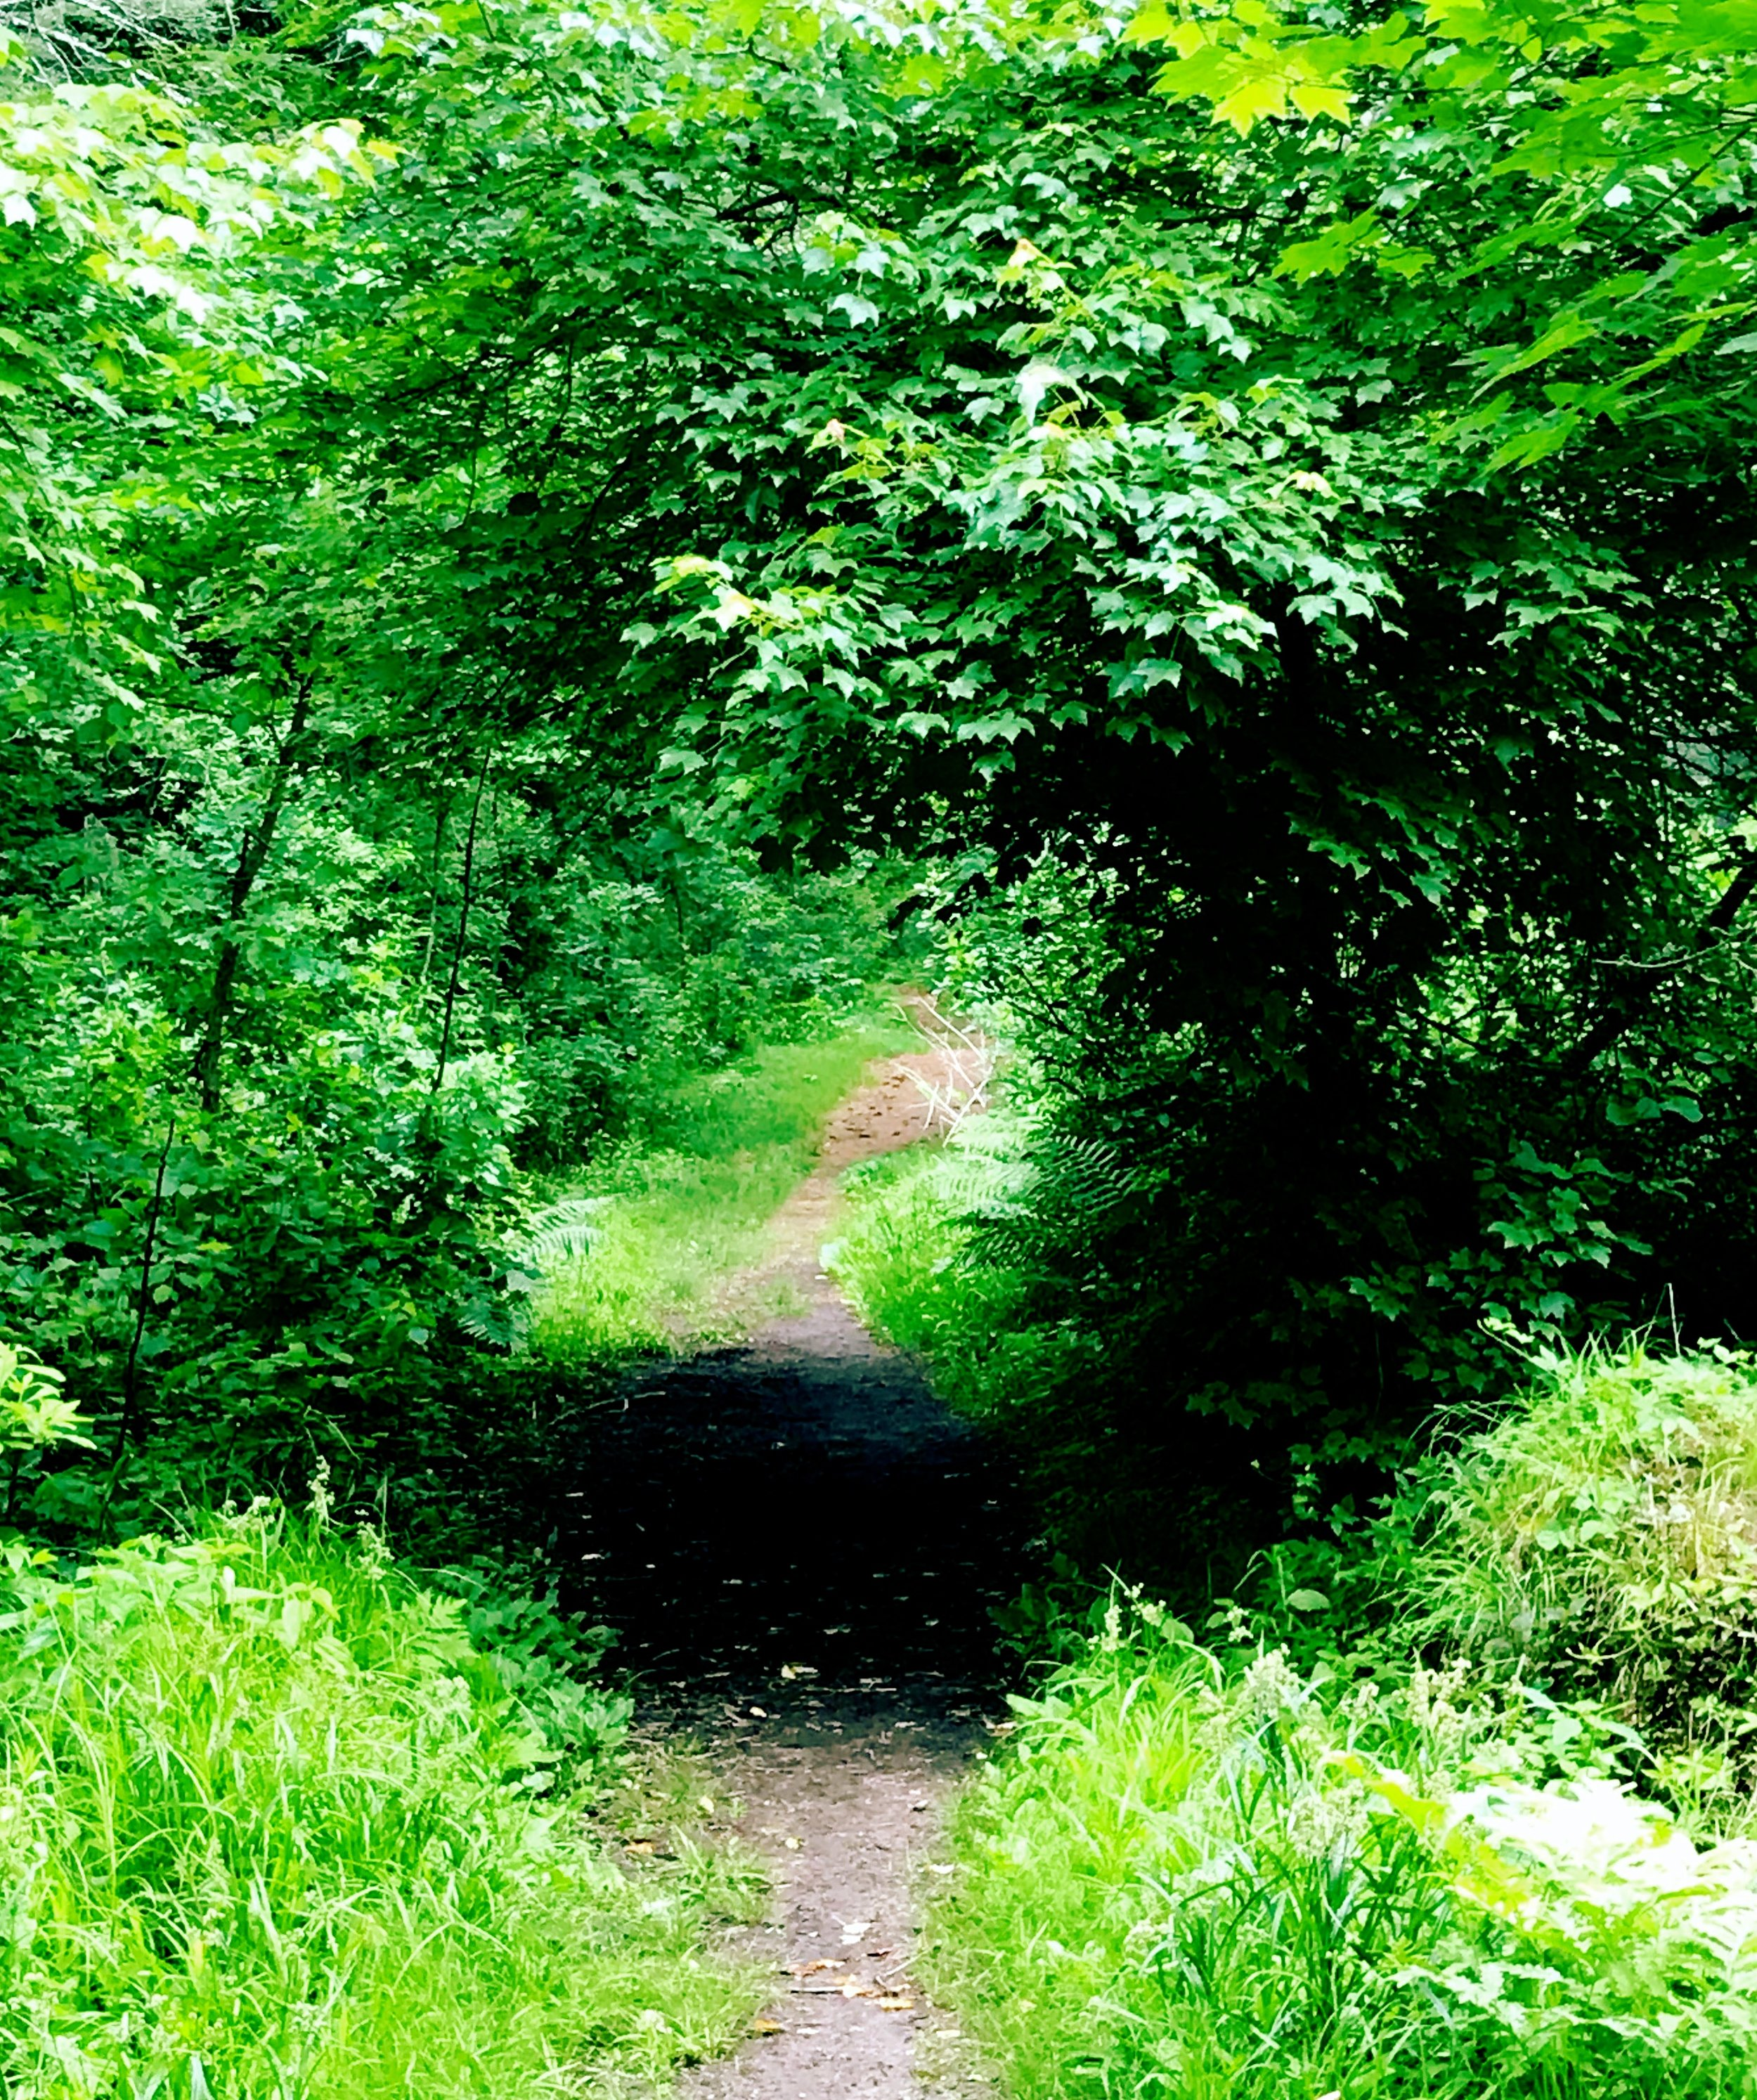 enchangting path.JPG